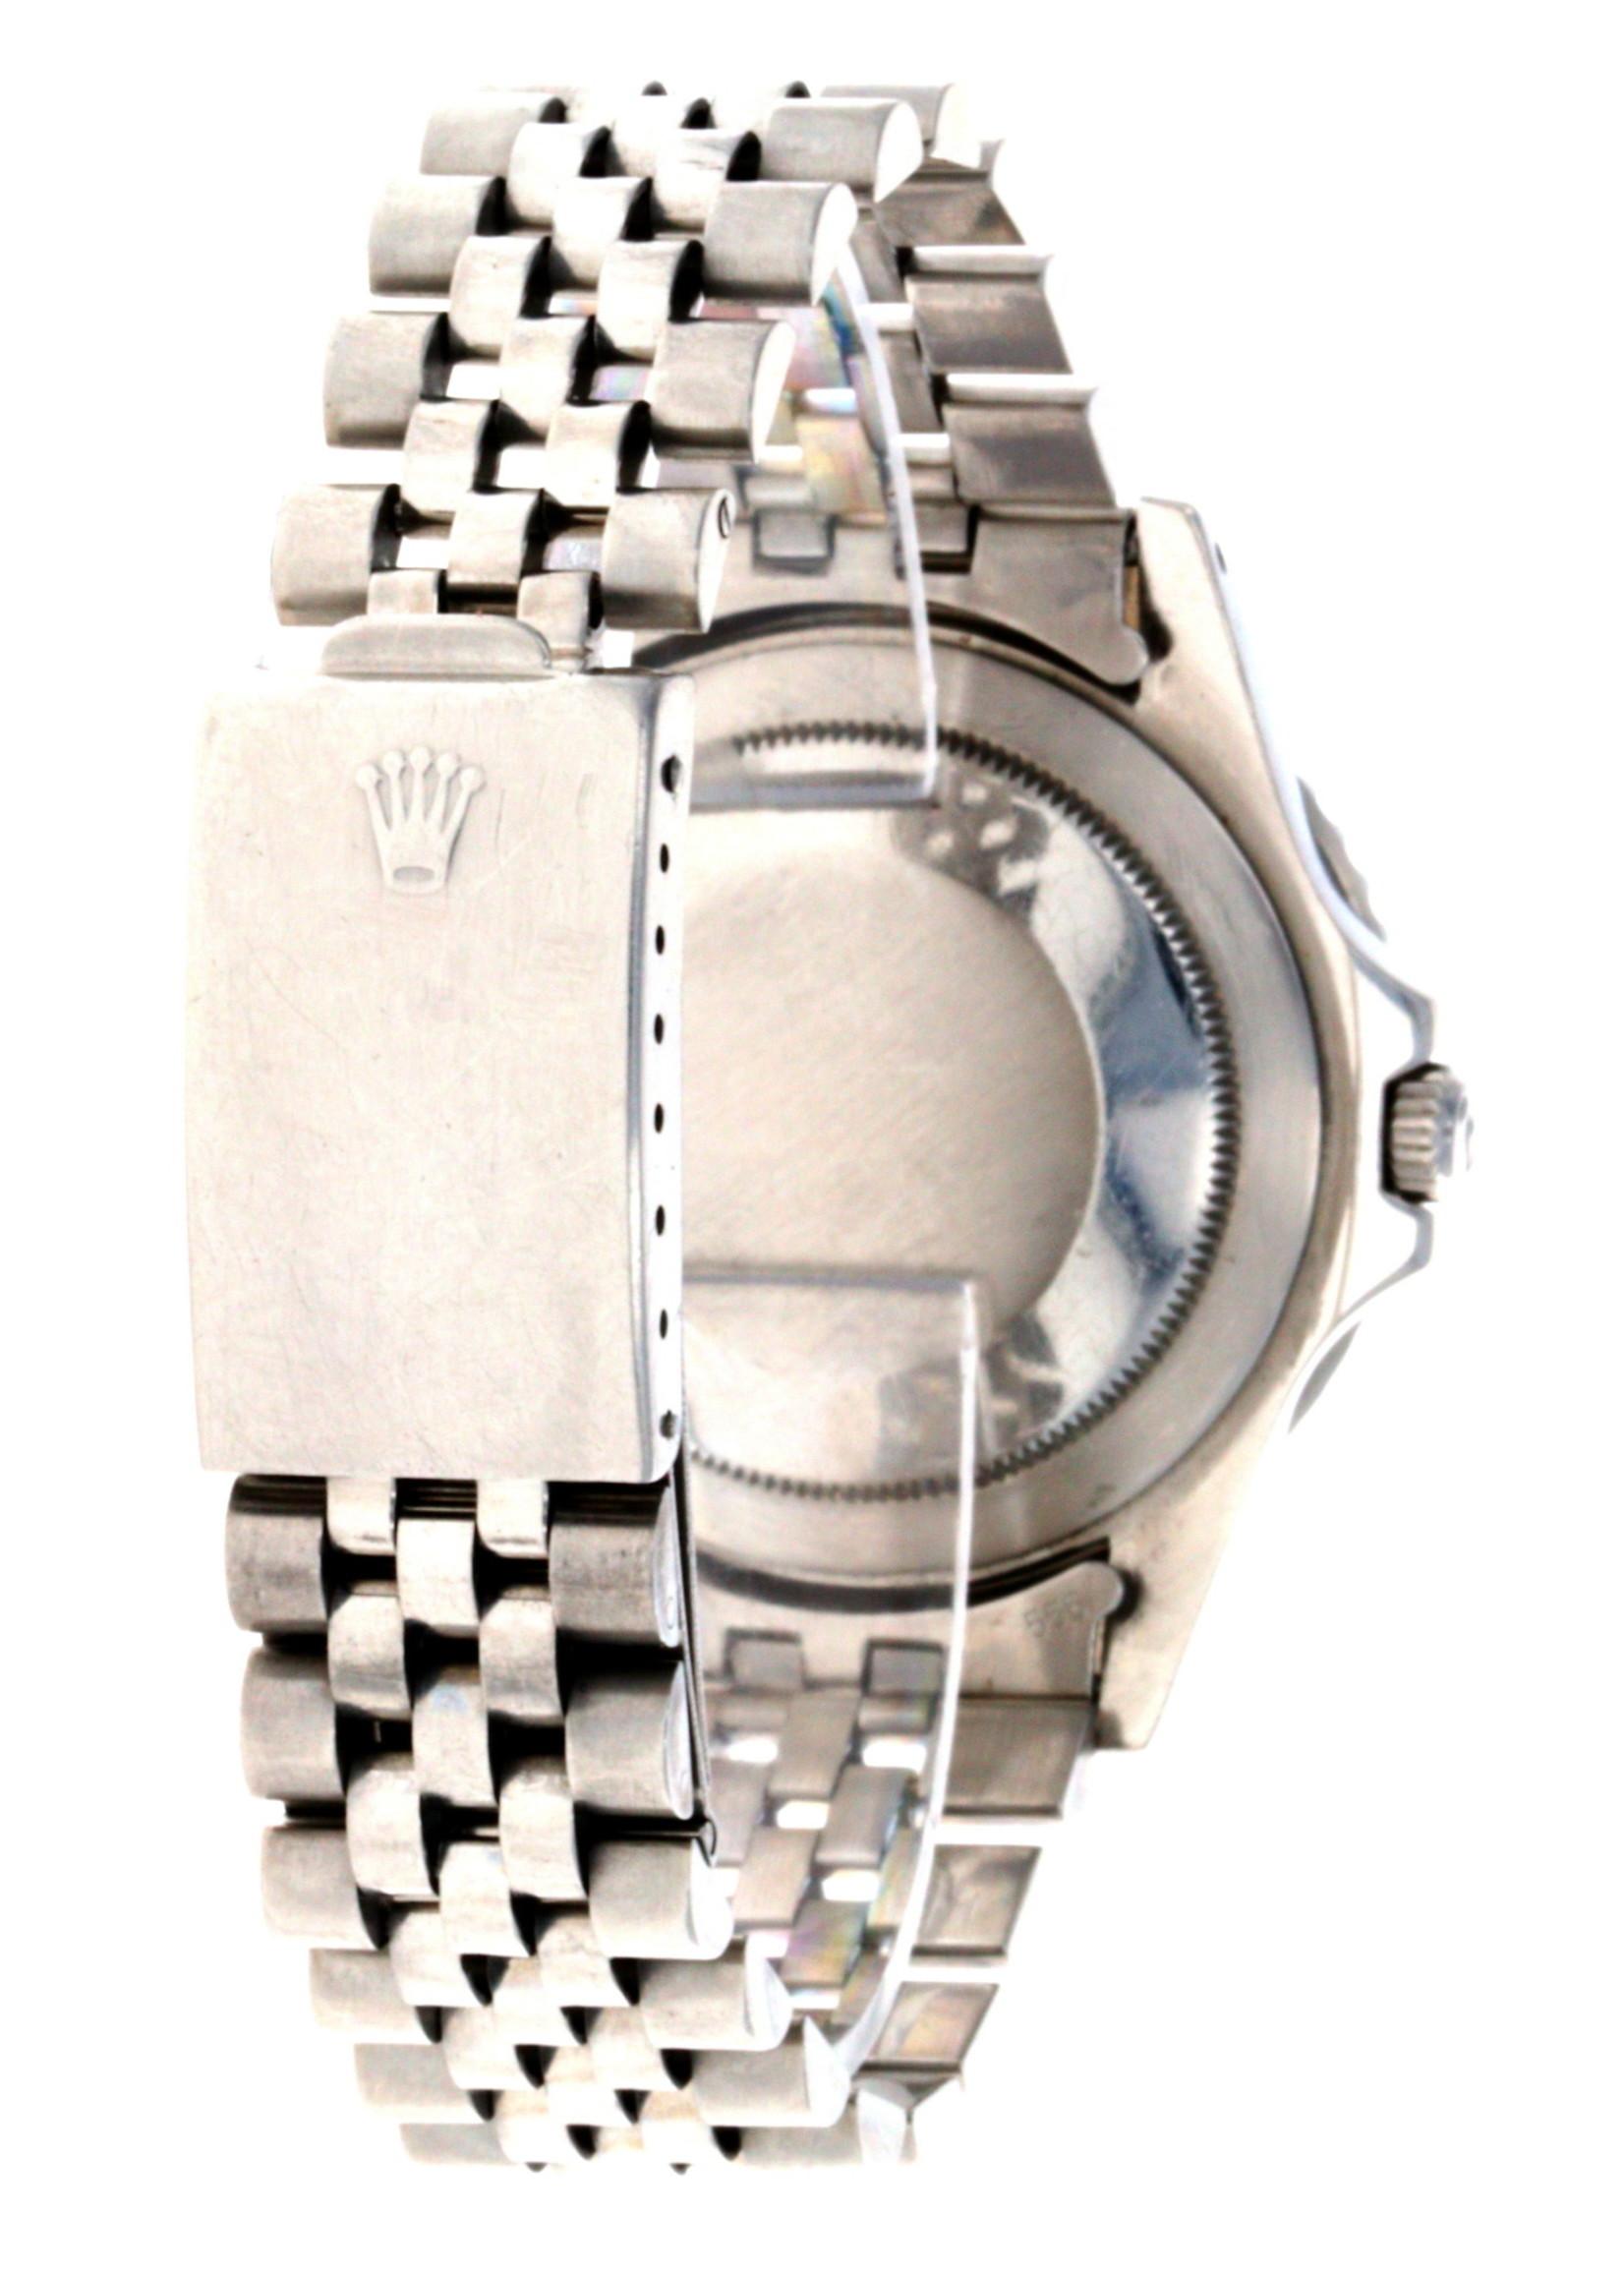 Rolex ROLEX GMT MASTER (1980) #16750 3075 MOVEMENT - #62510H JUBILEE BRACELET (1983)